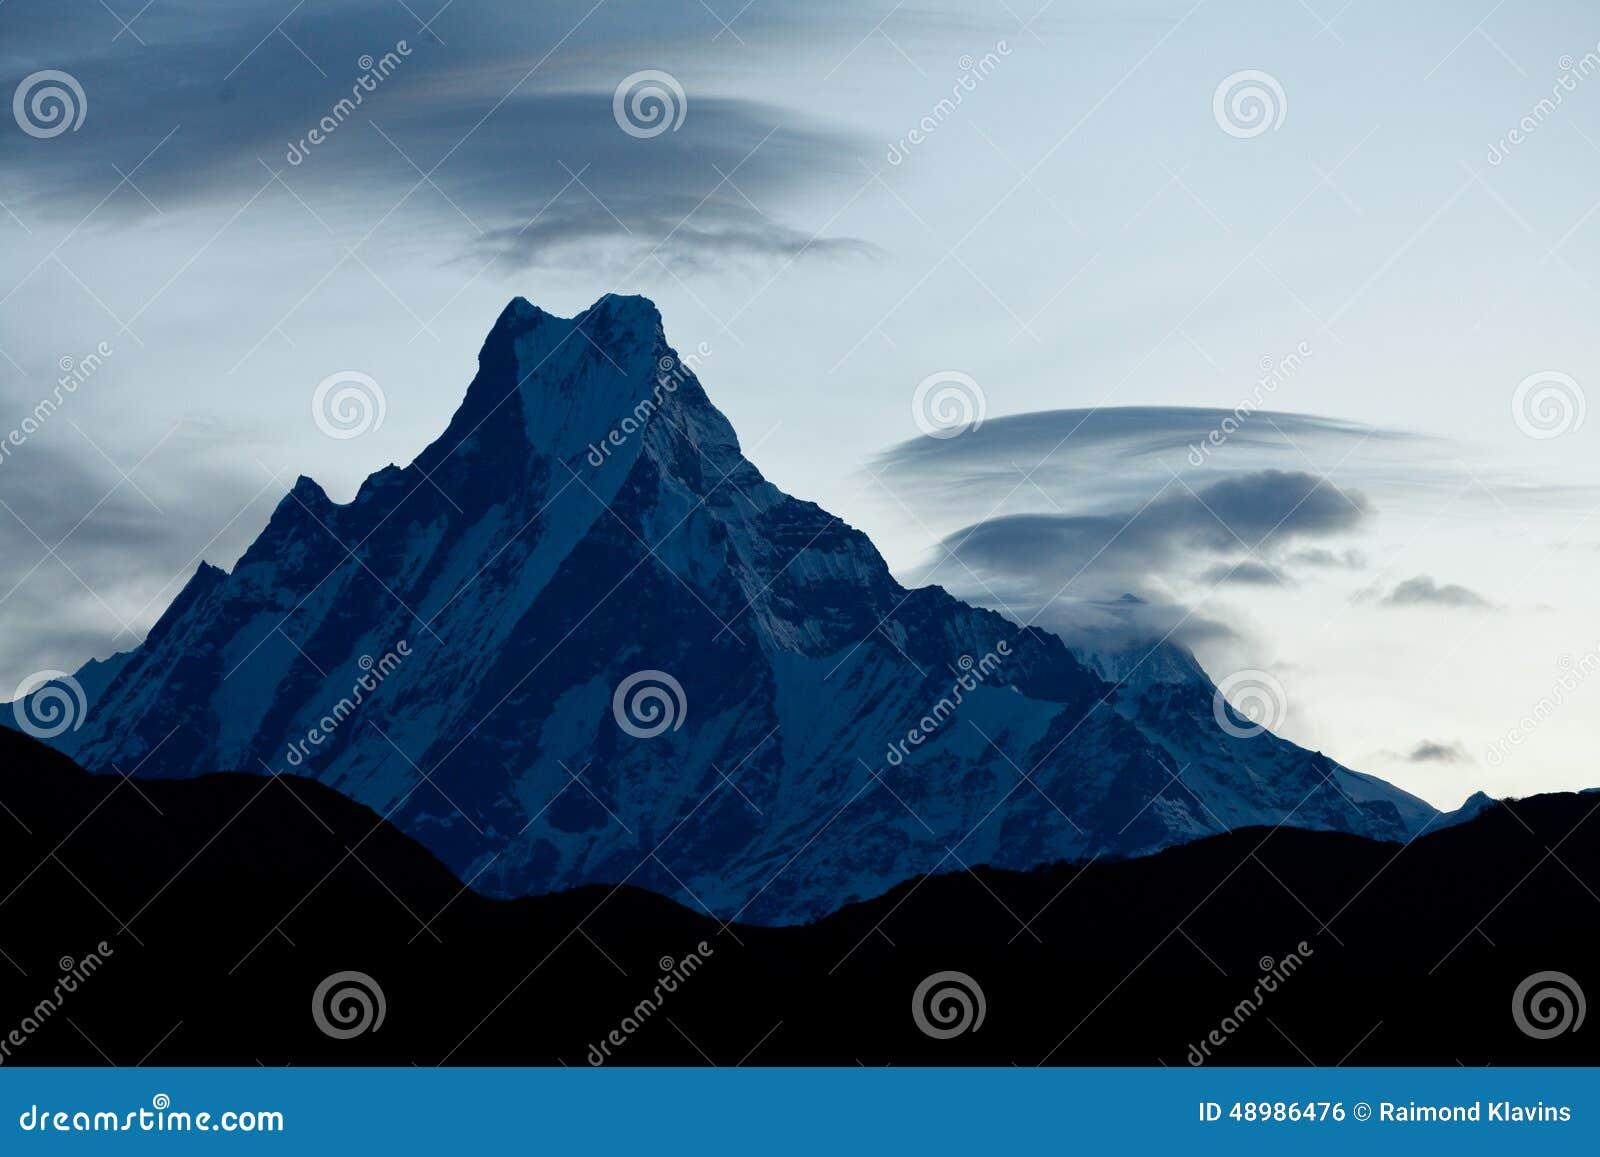 Mount machapuchare or fish tail at sunrise himalaya for Peak fishing times